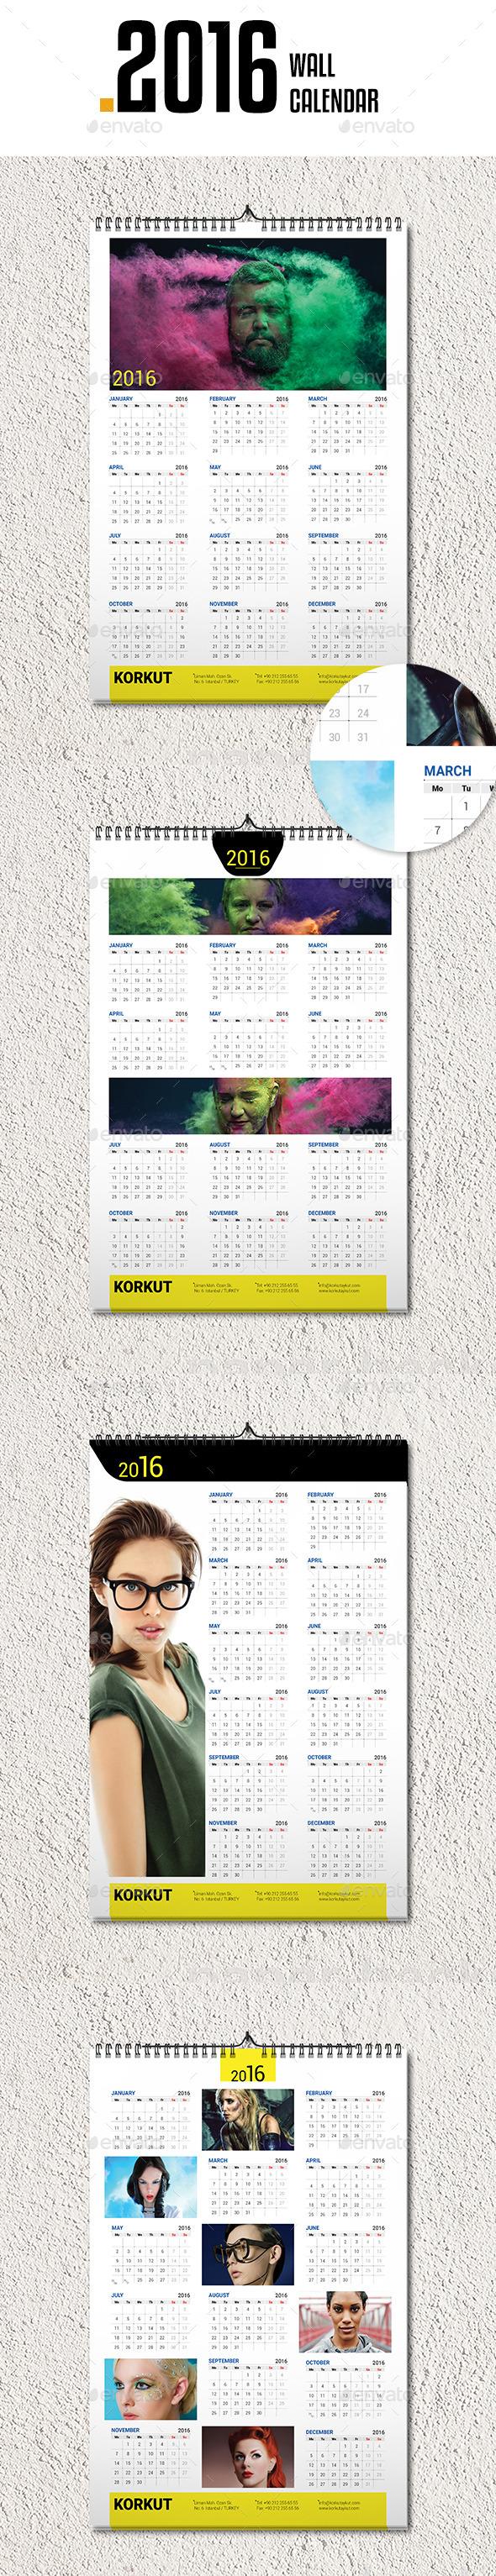 Wall Calendar 2016 v4 - Calendars Stationery